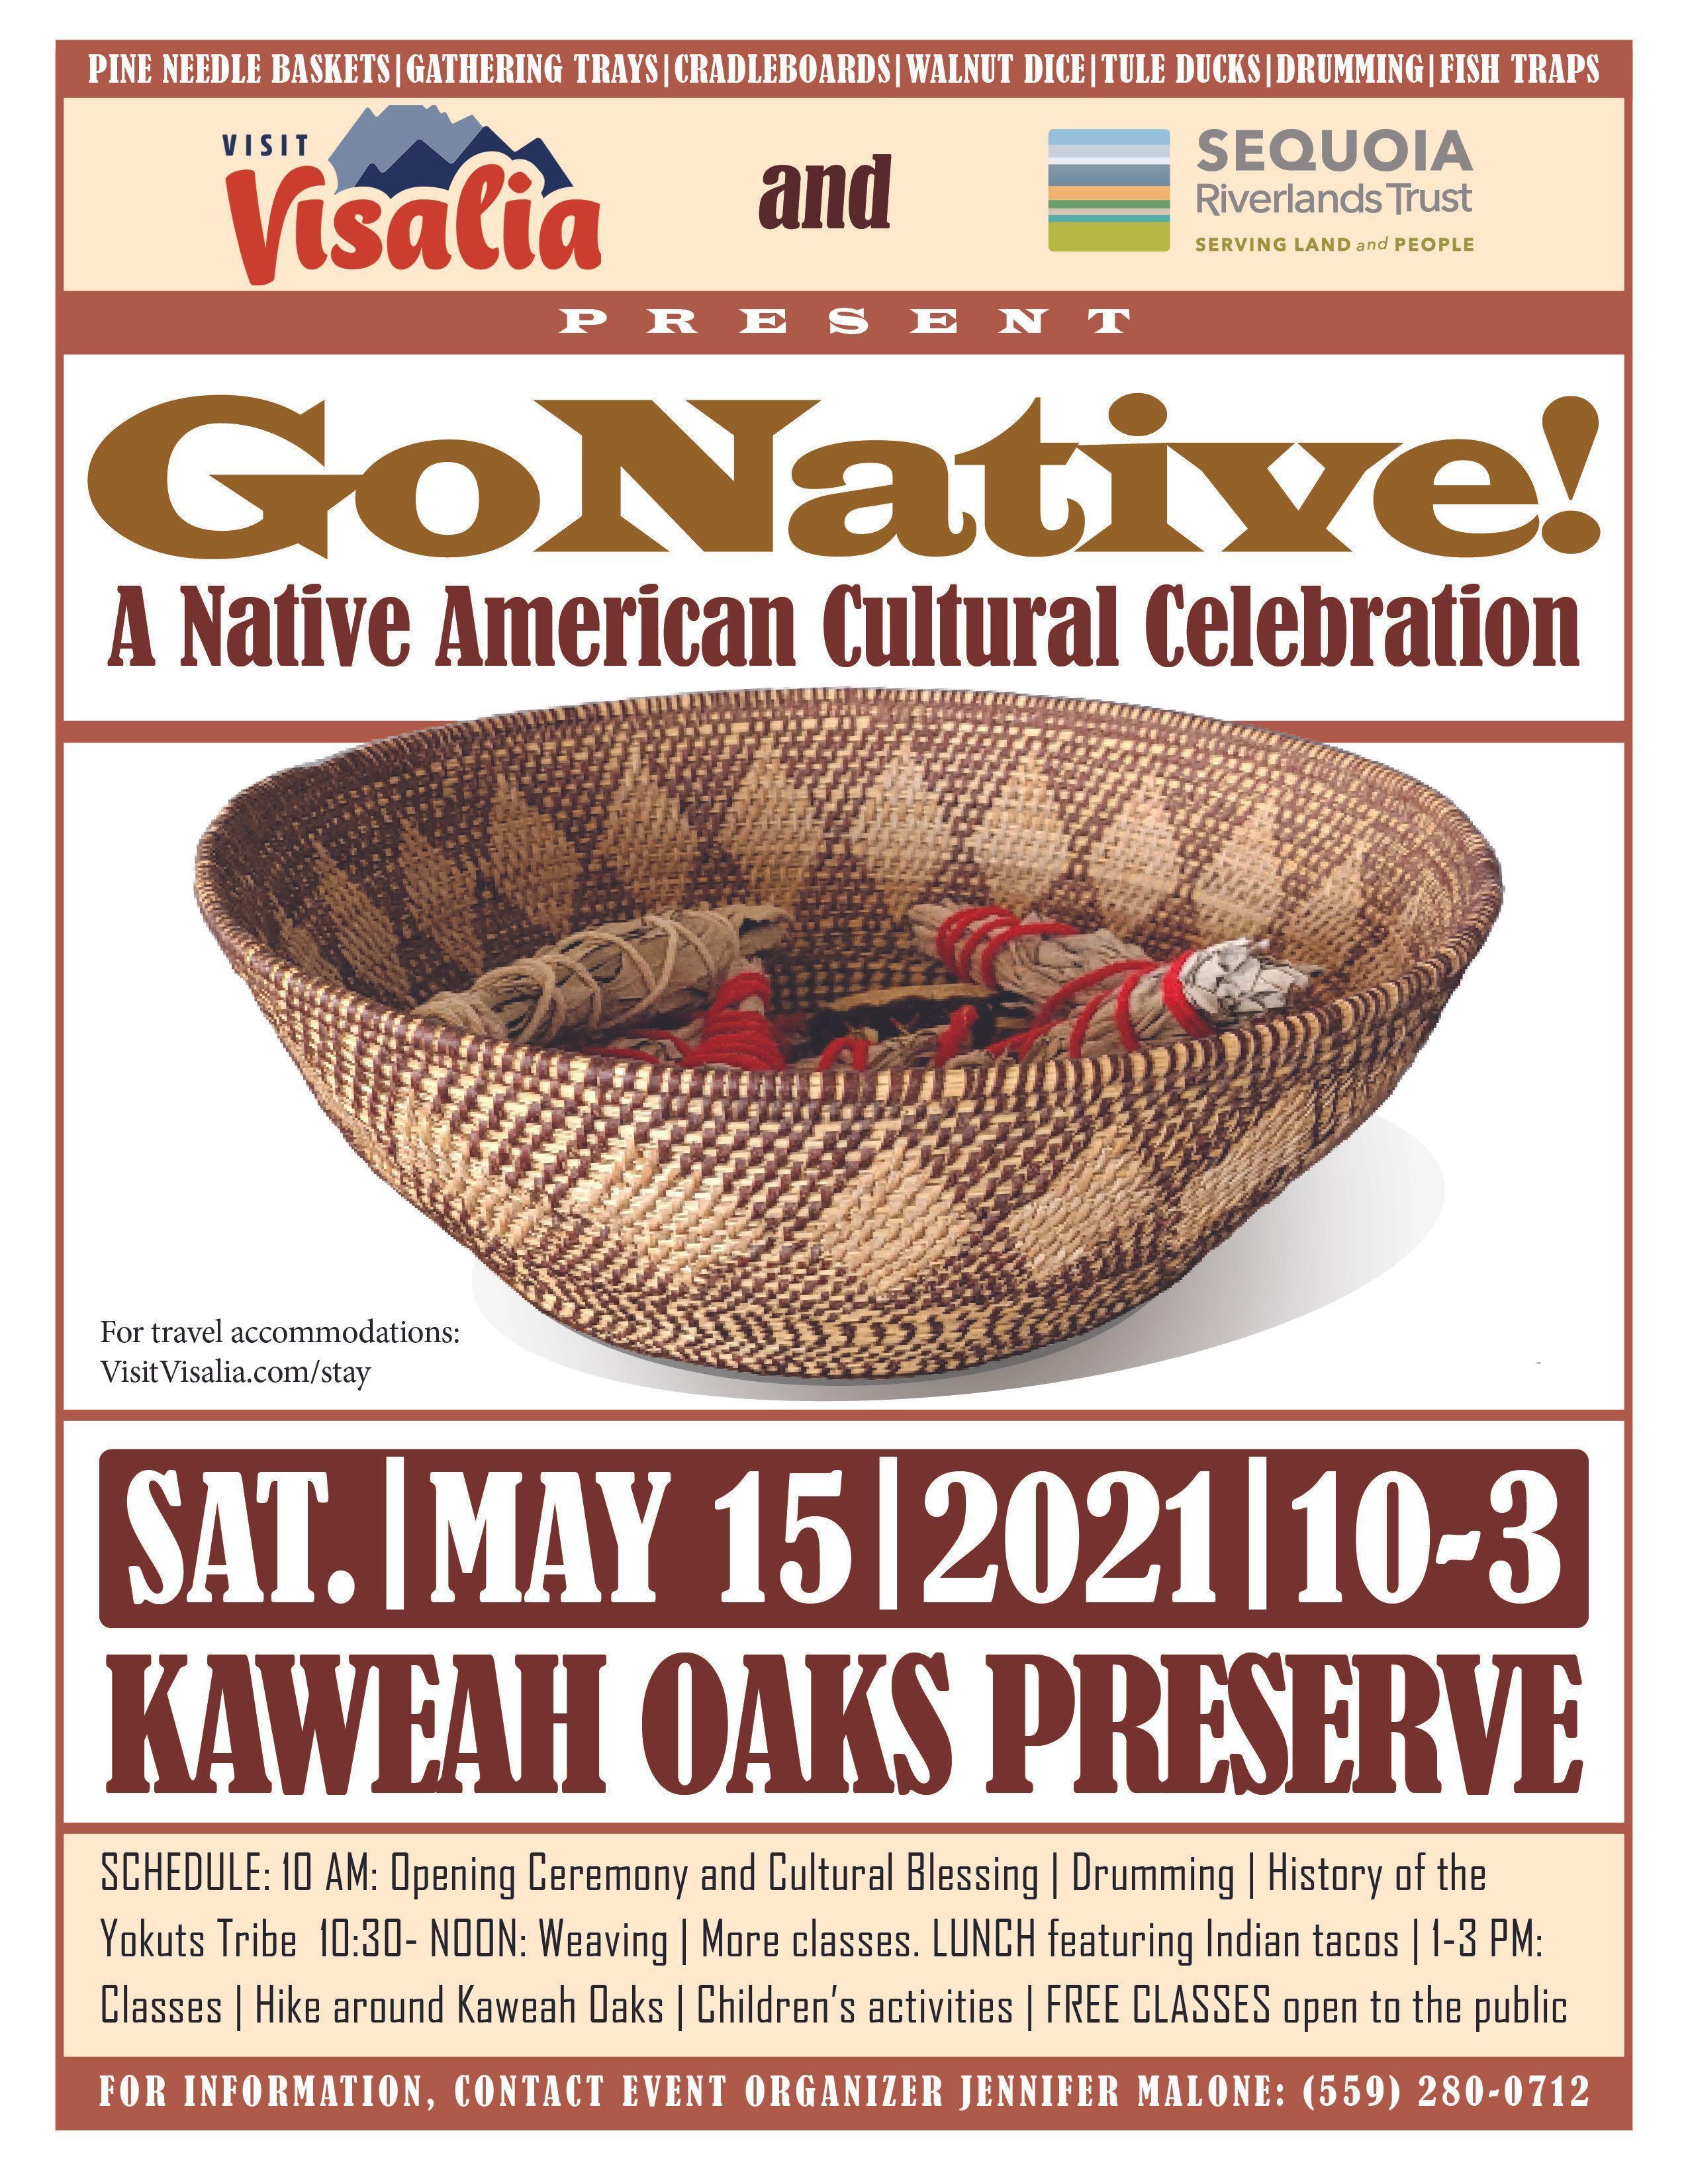 Go Native Returns to Kaweah Oaks May 15